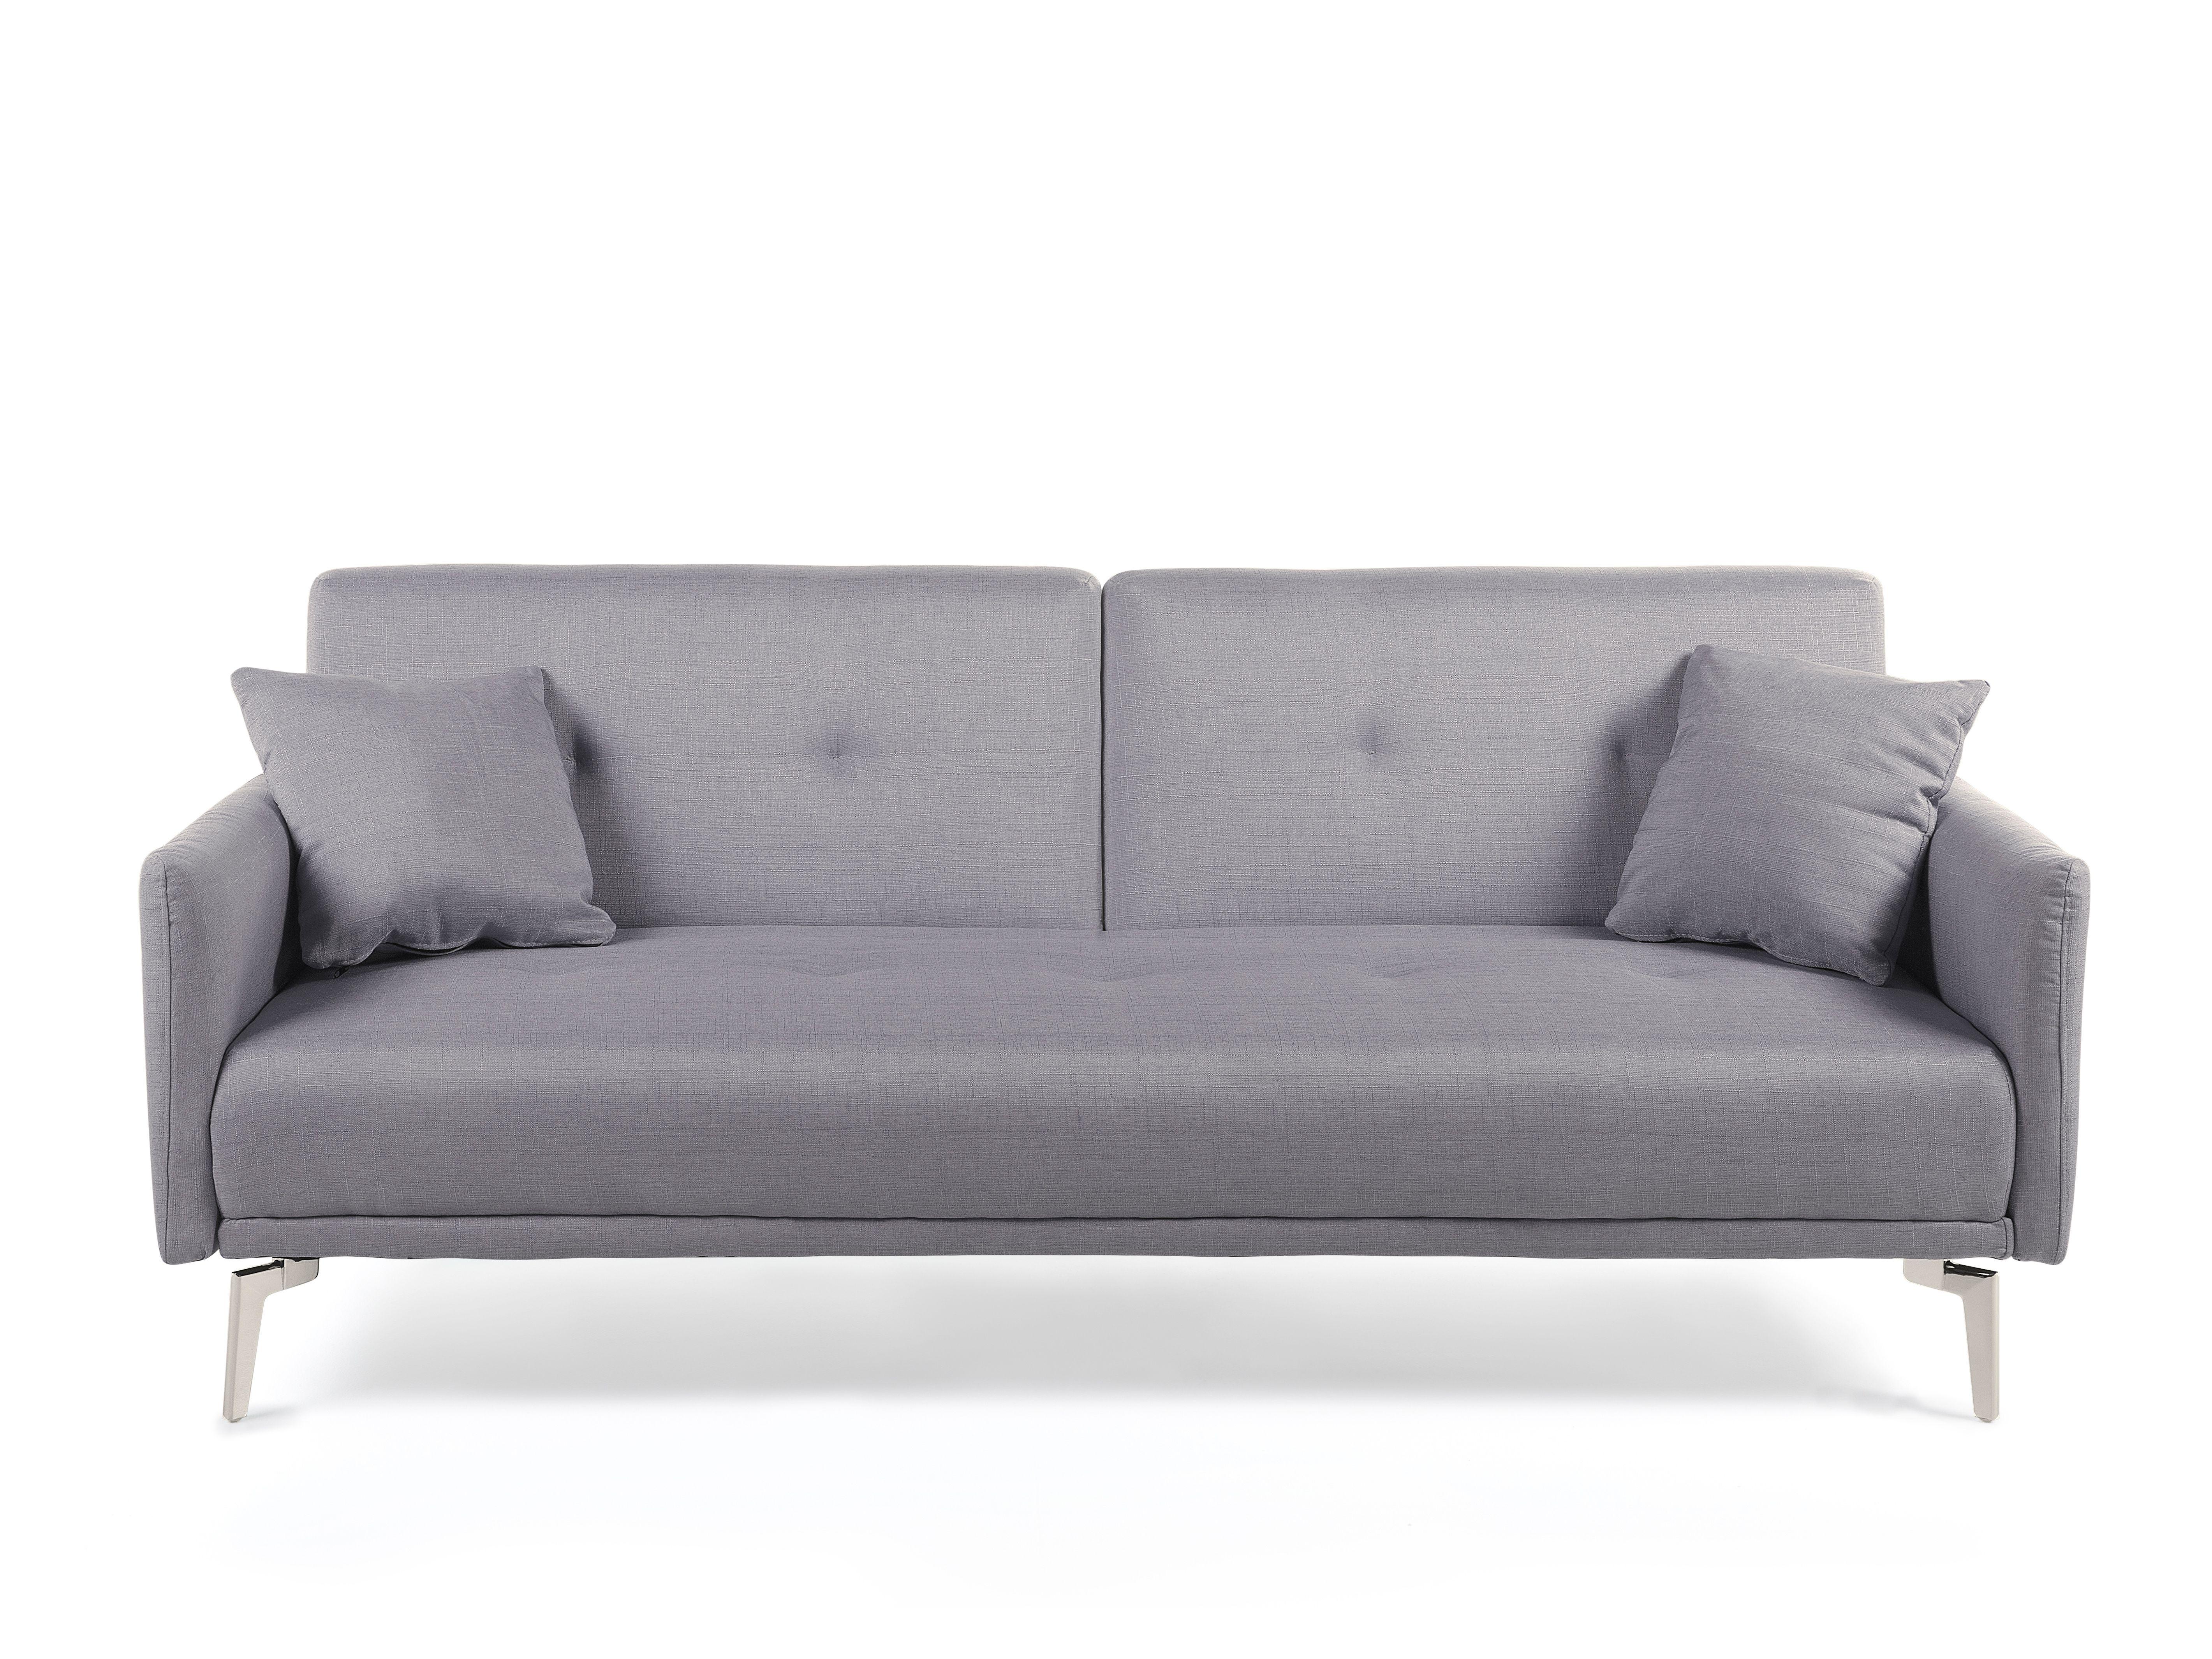 Sofa Z Funkcja Spania Szara Kanapa Rozkladana Wersalka Lucan Sofa Furniture Couch